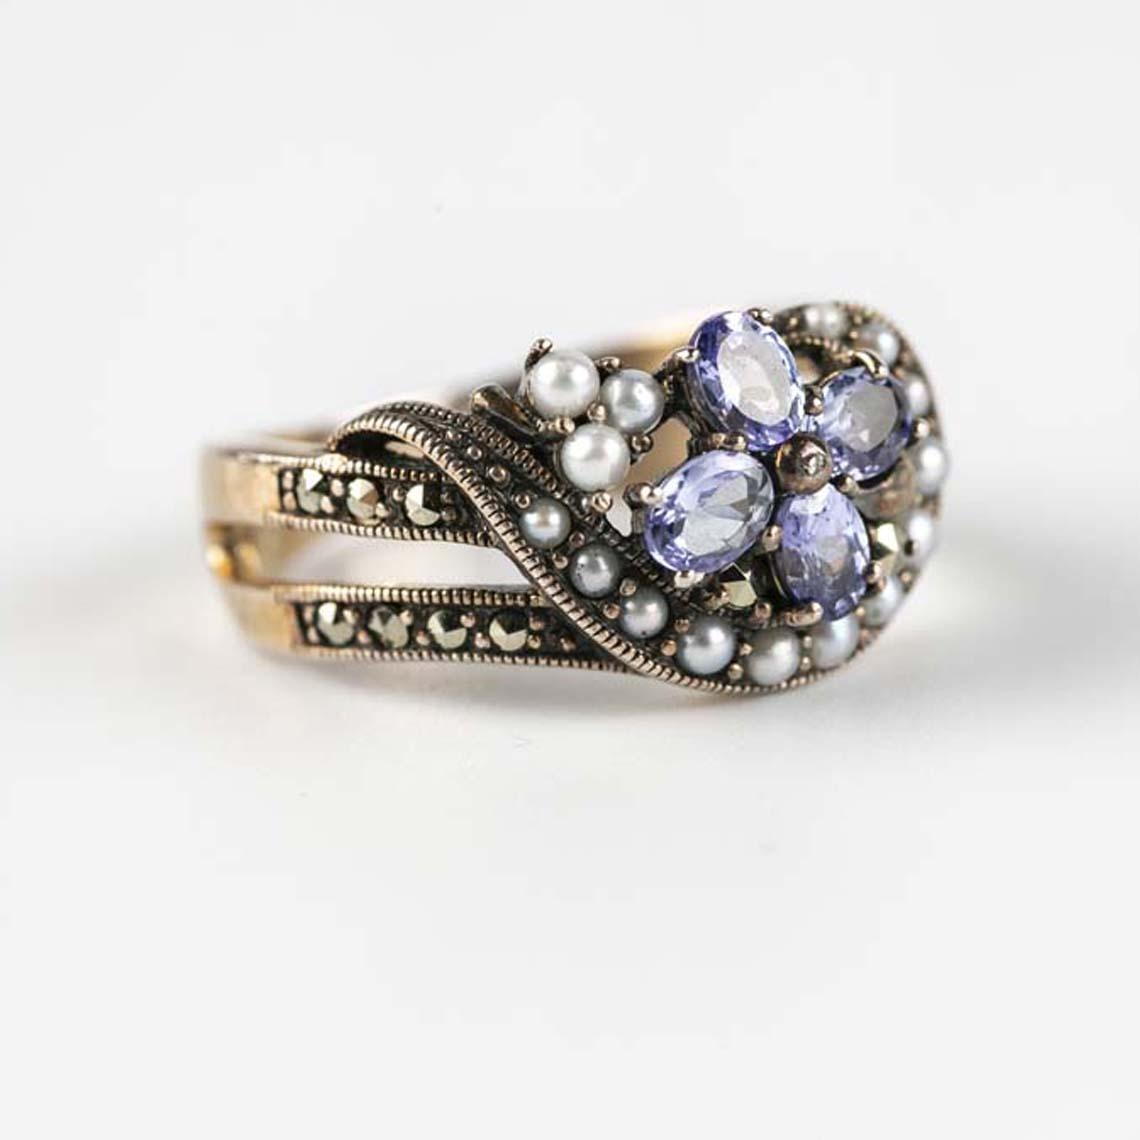 Tanzanite and pearl ring